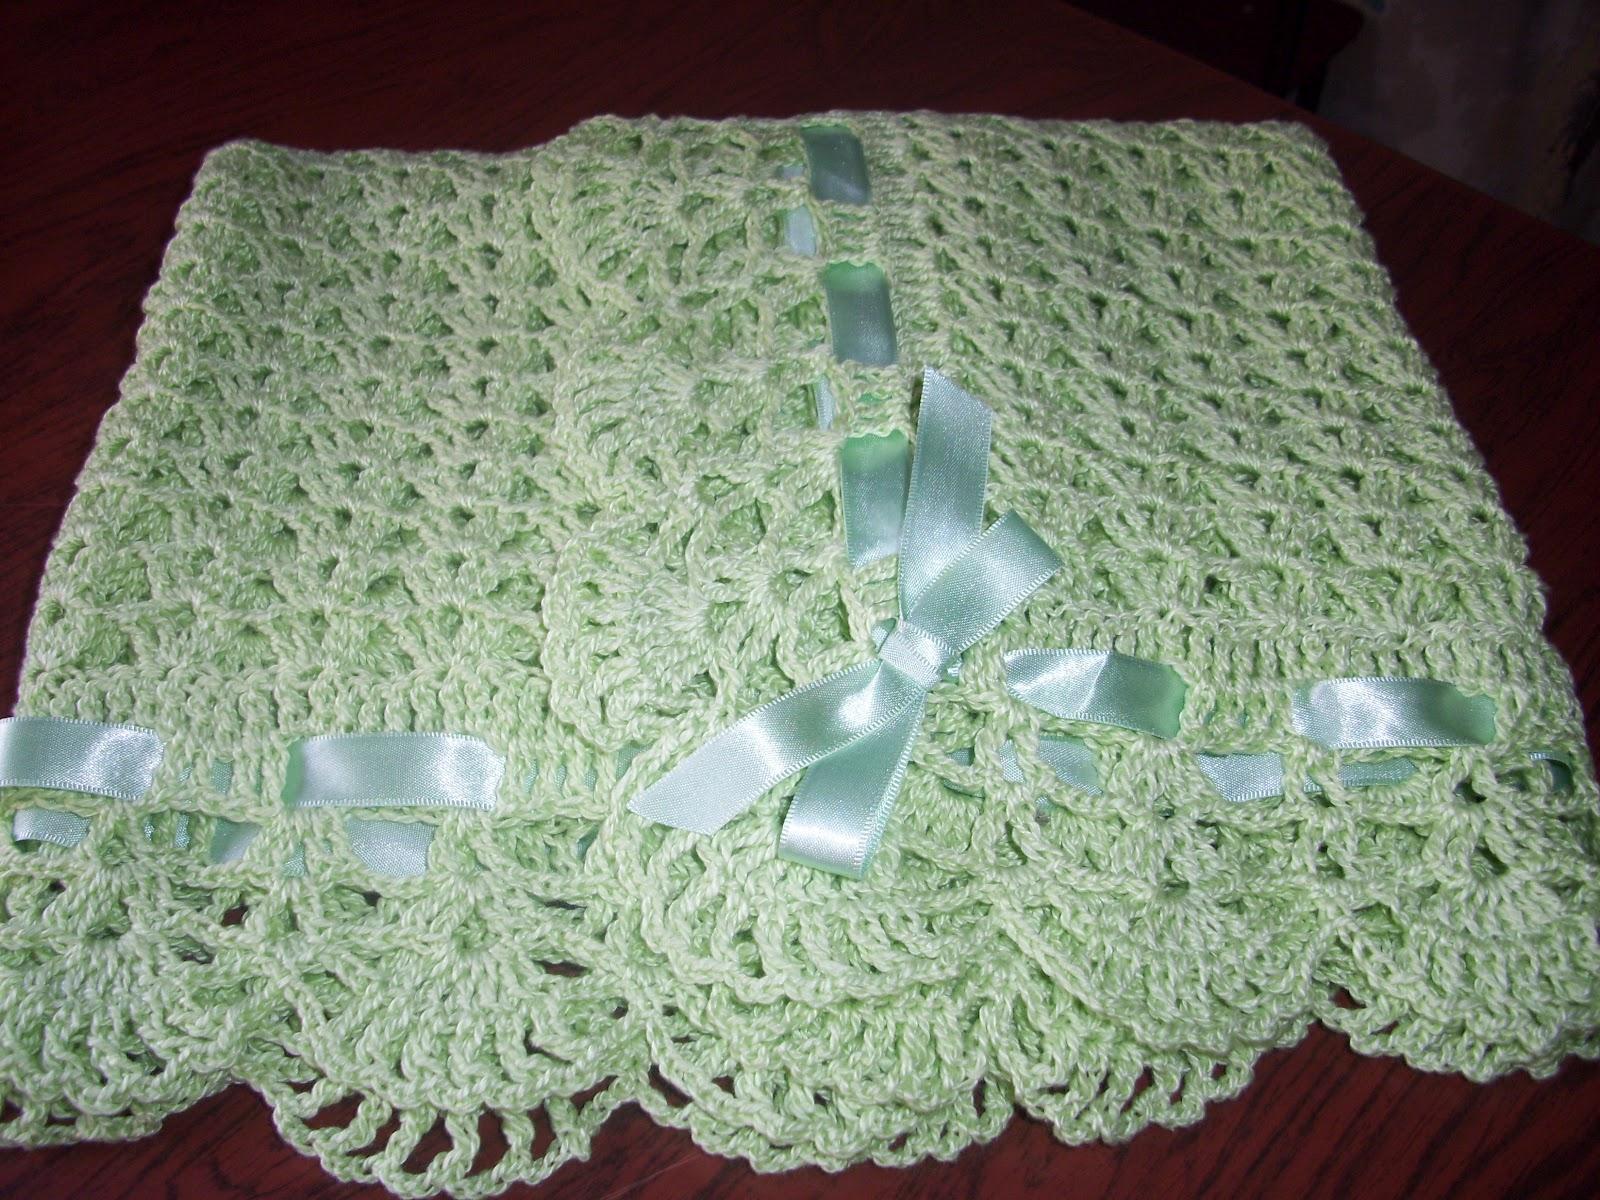 Puntos crochet para mantilla beb imagui - Manta de crochet facil ...